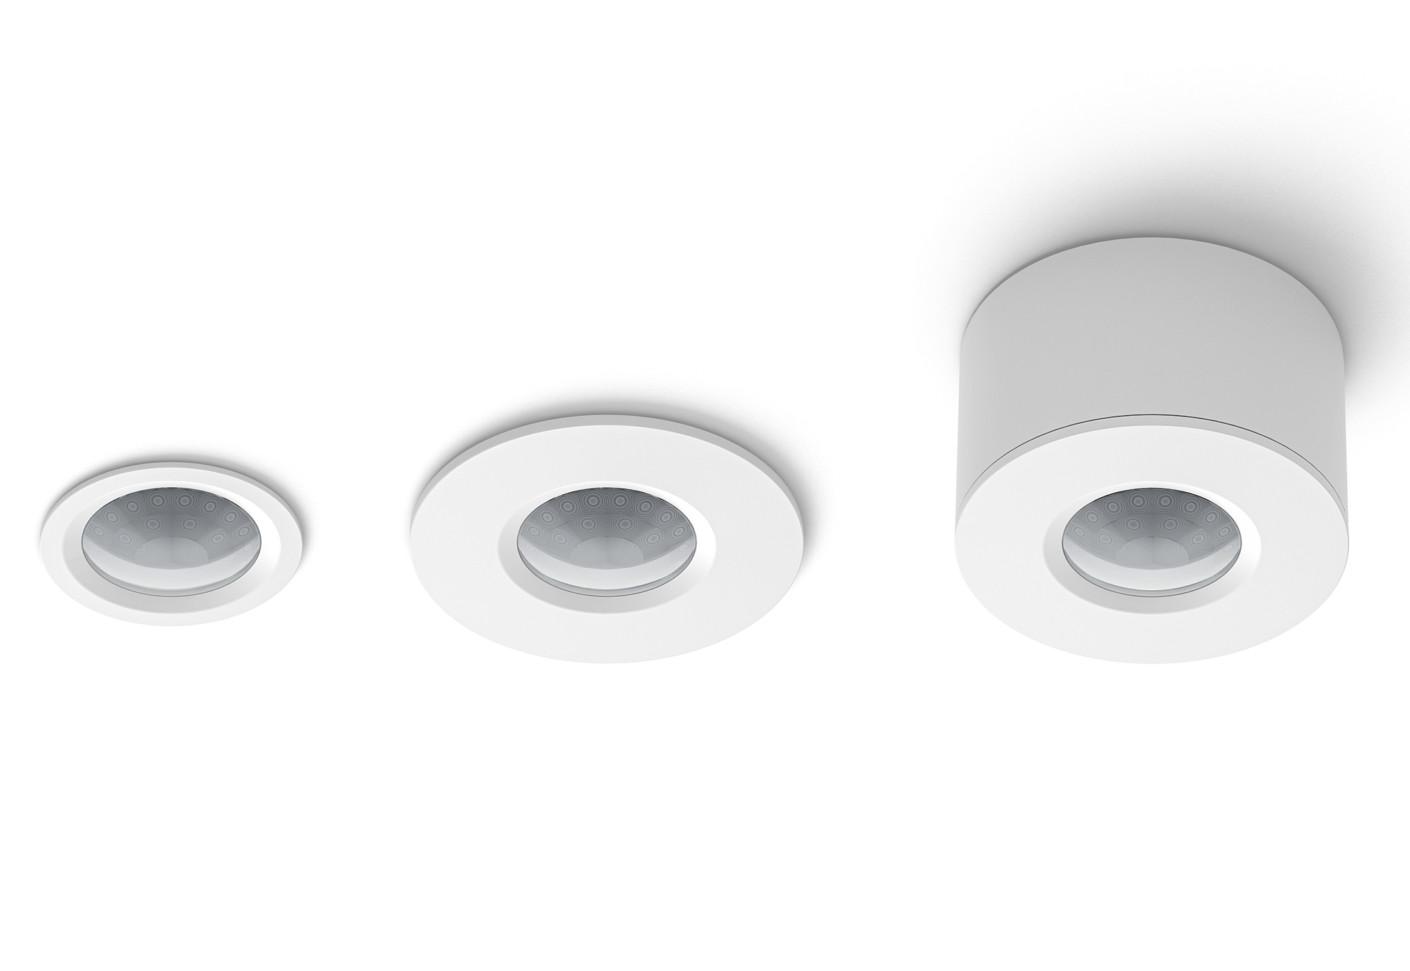 motion security light twin spot pir security light. Black Bedroom Furniture Sets. Home Design Ideas